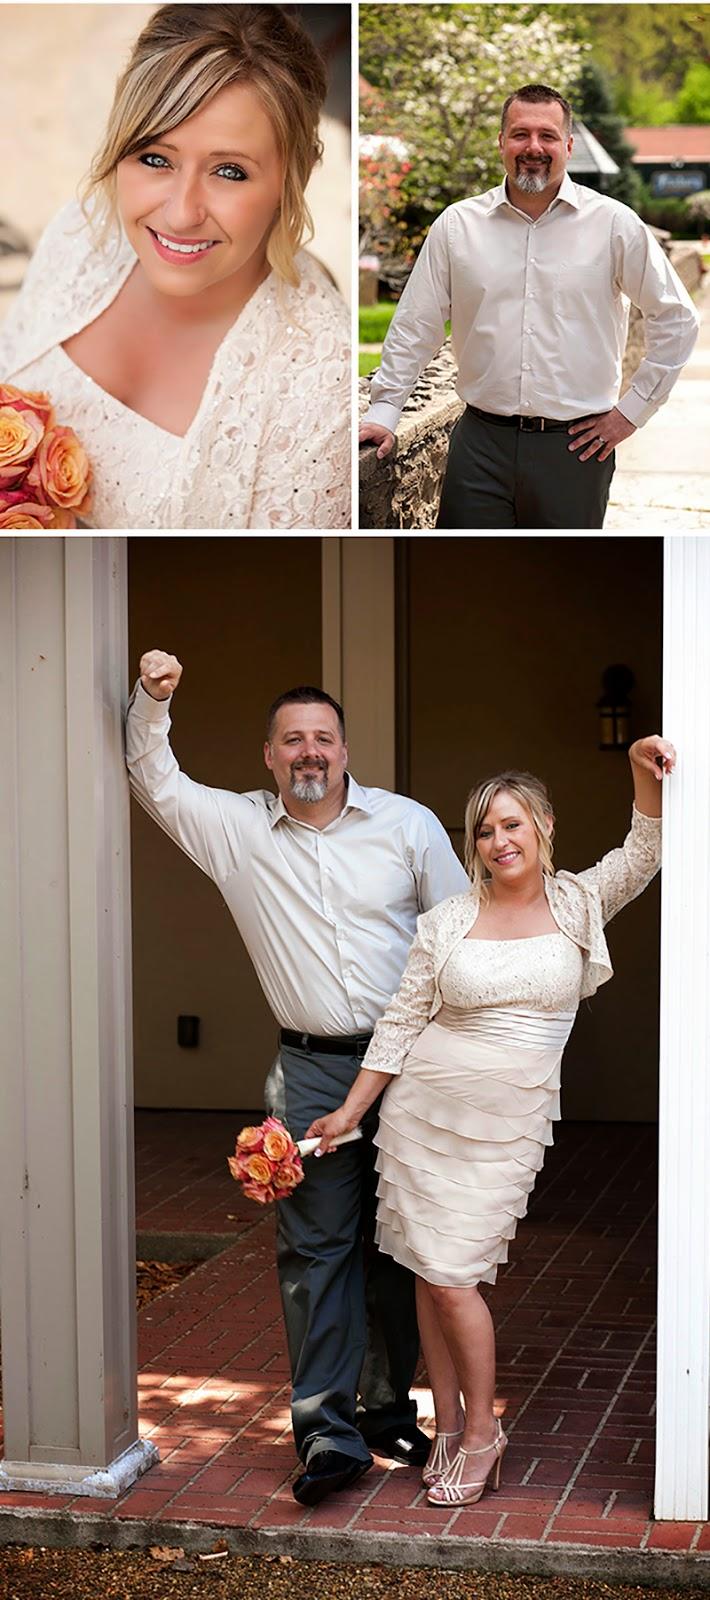 Foxburg Inn wedding Foxburg, PA Sandra Jackson Photography